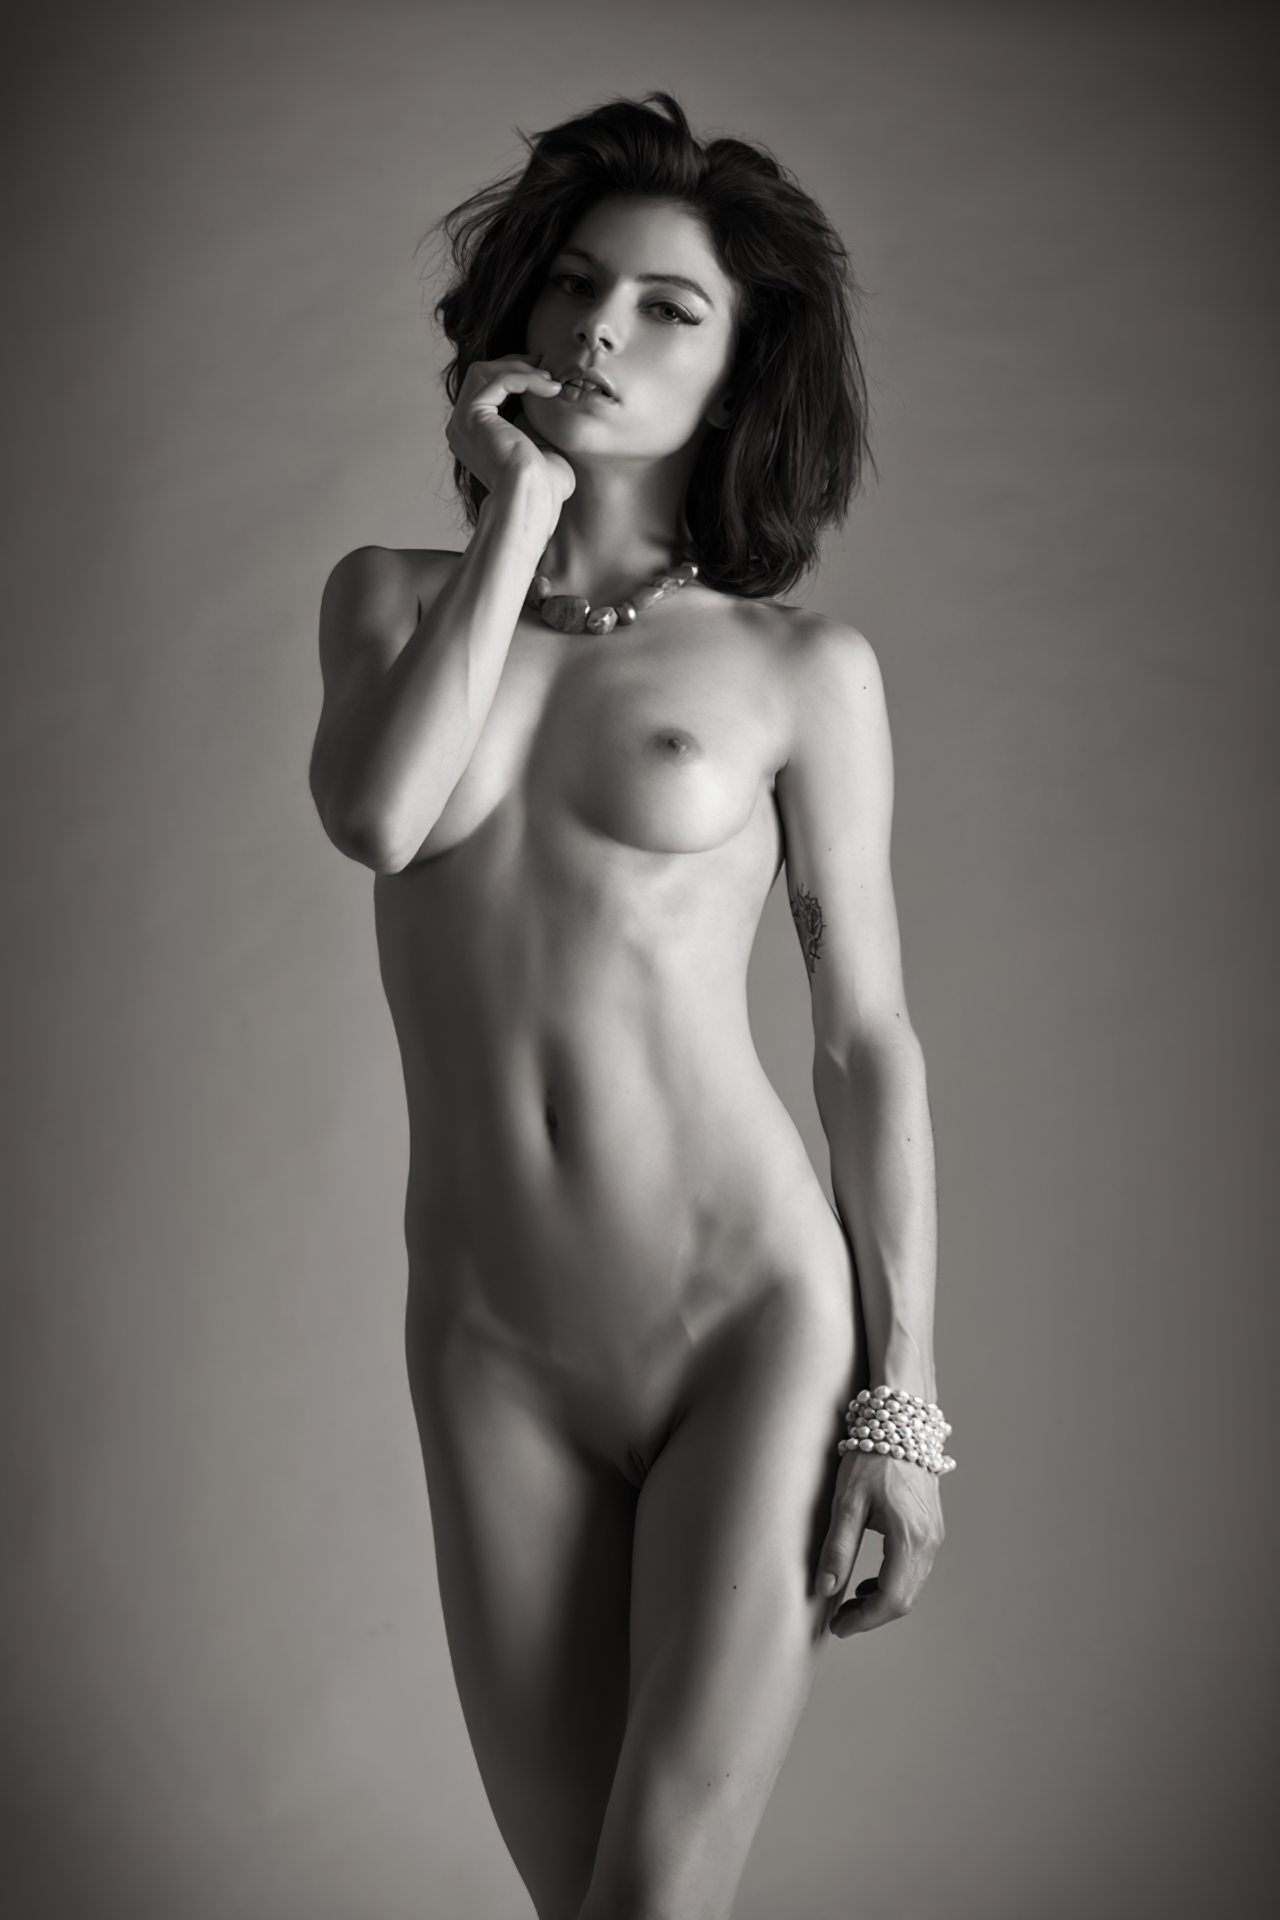 Fotos de Mulheres Nuas (44)